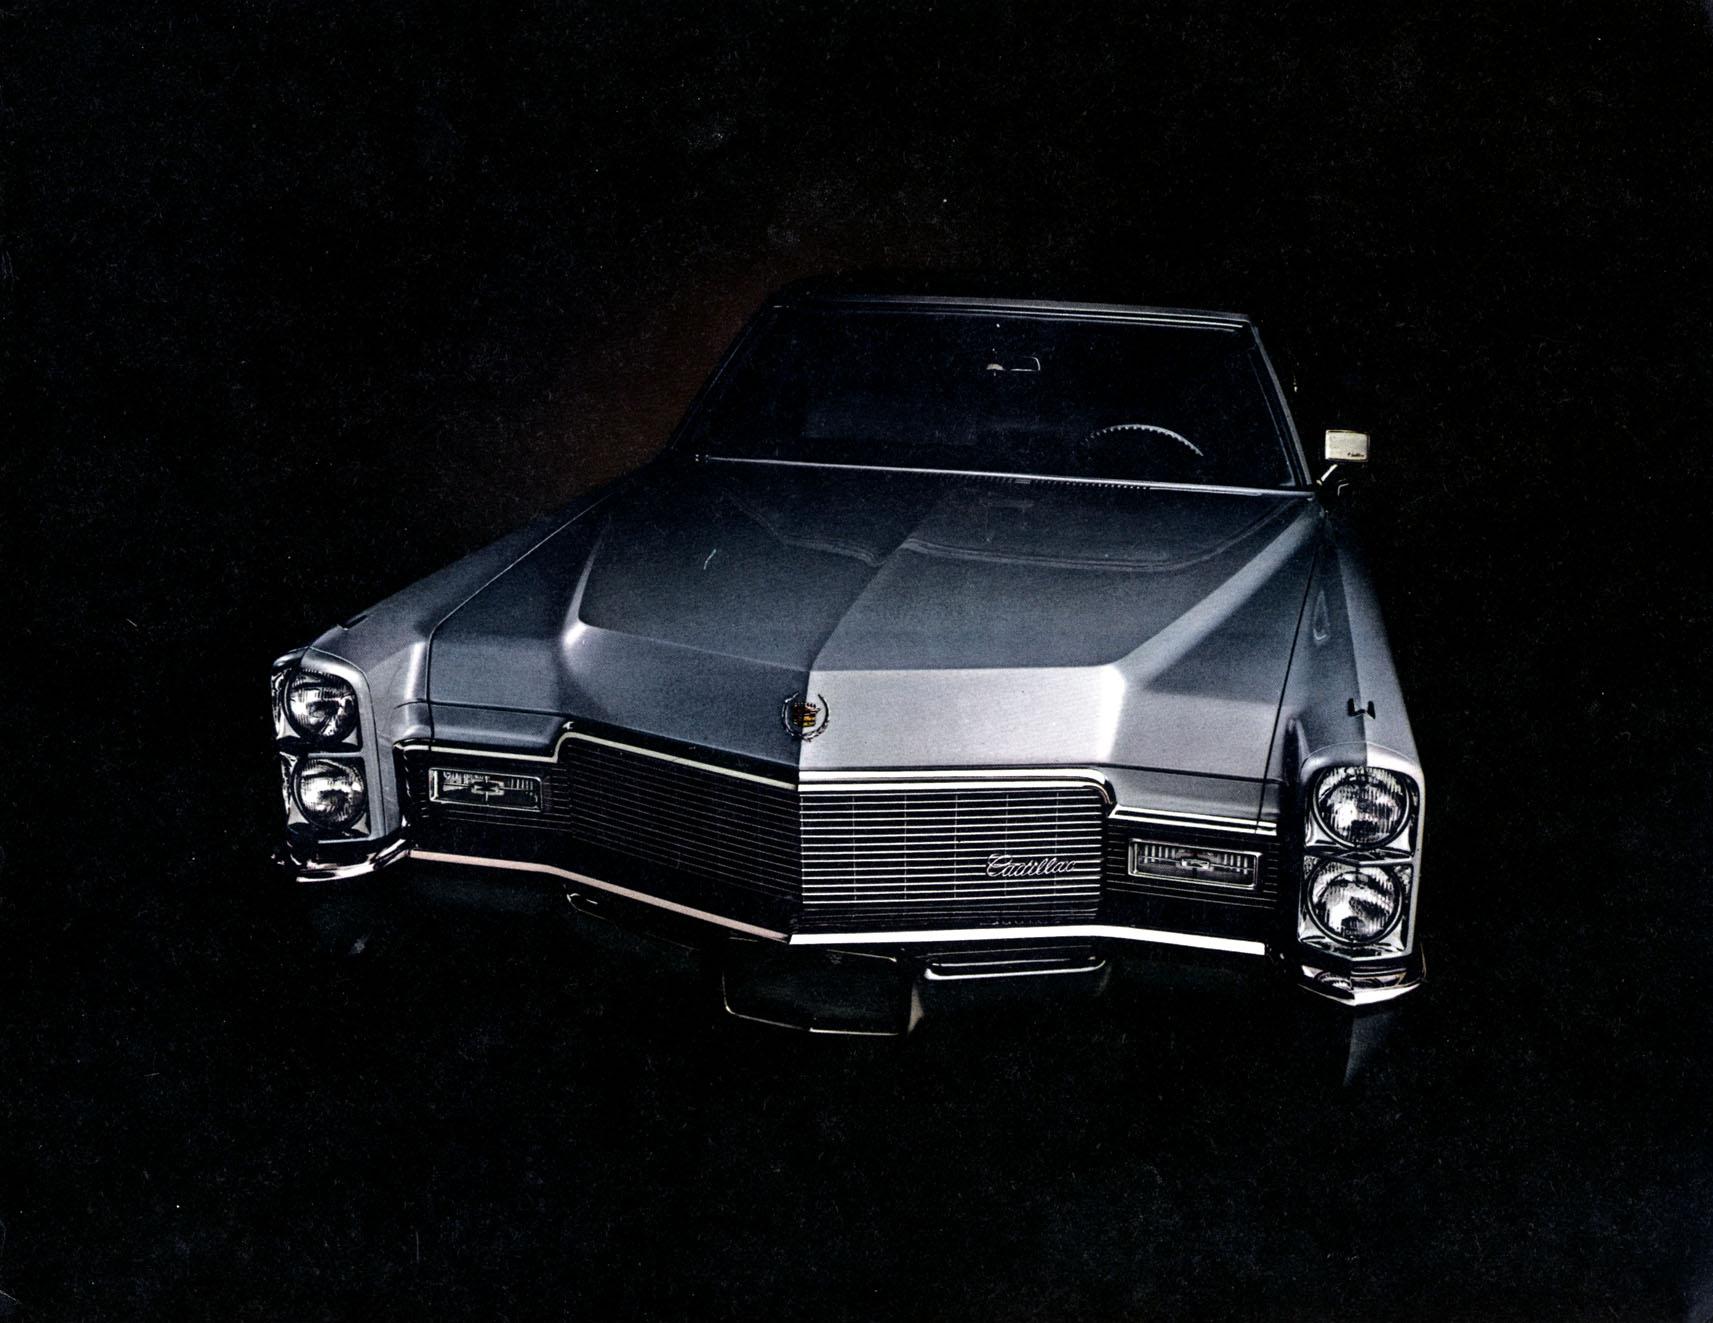 TunnelRam_Cadillac (24).jpg